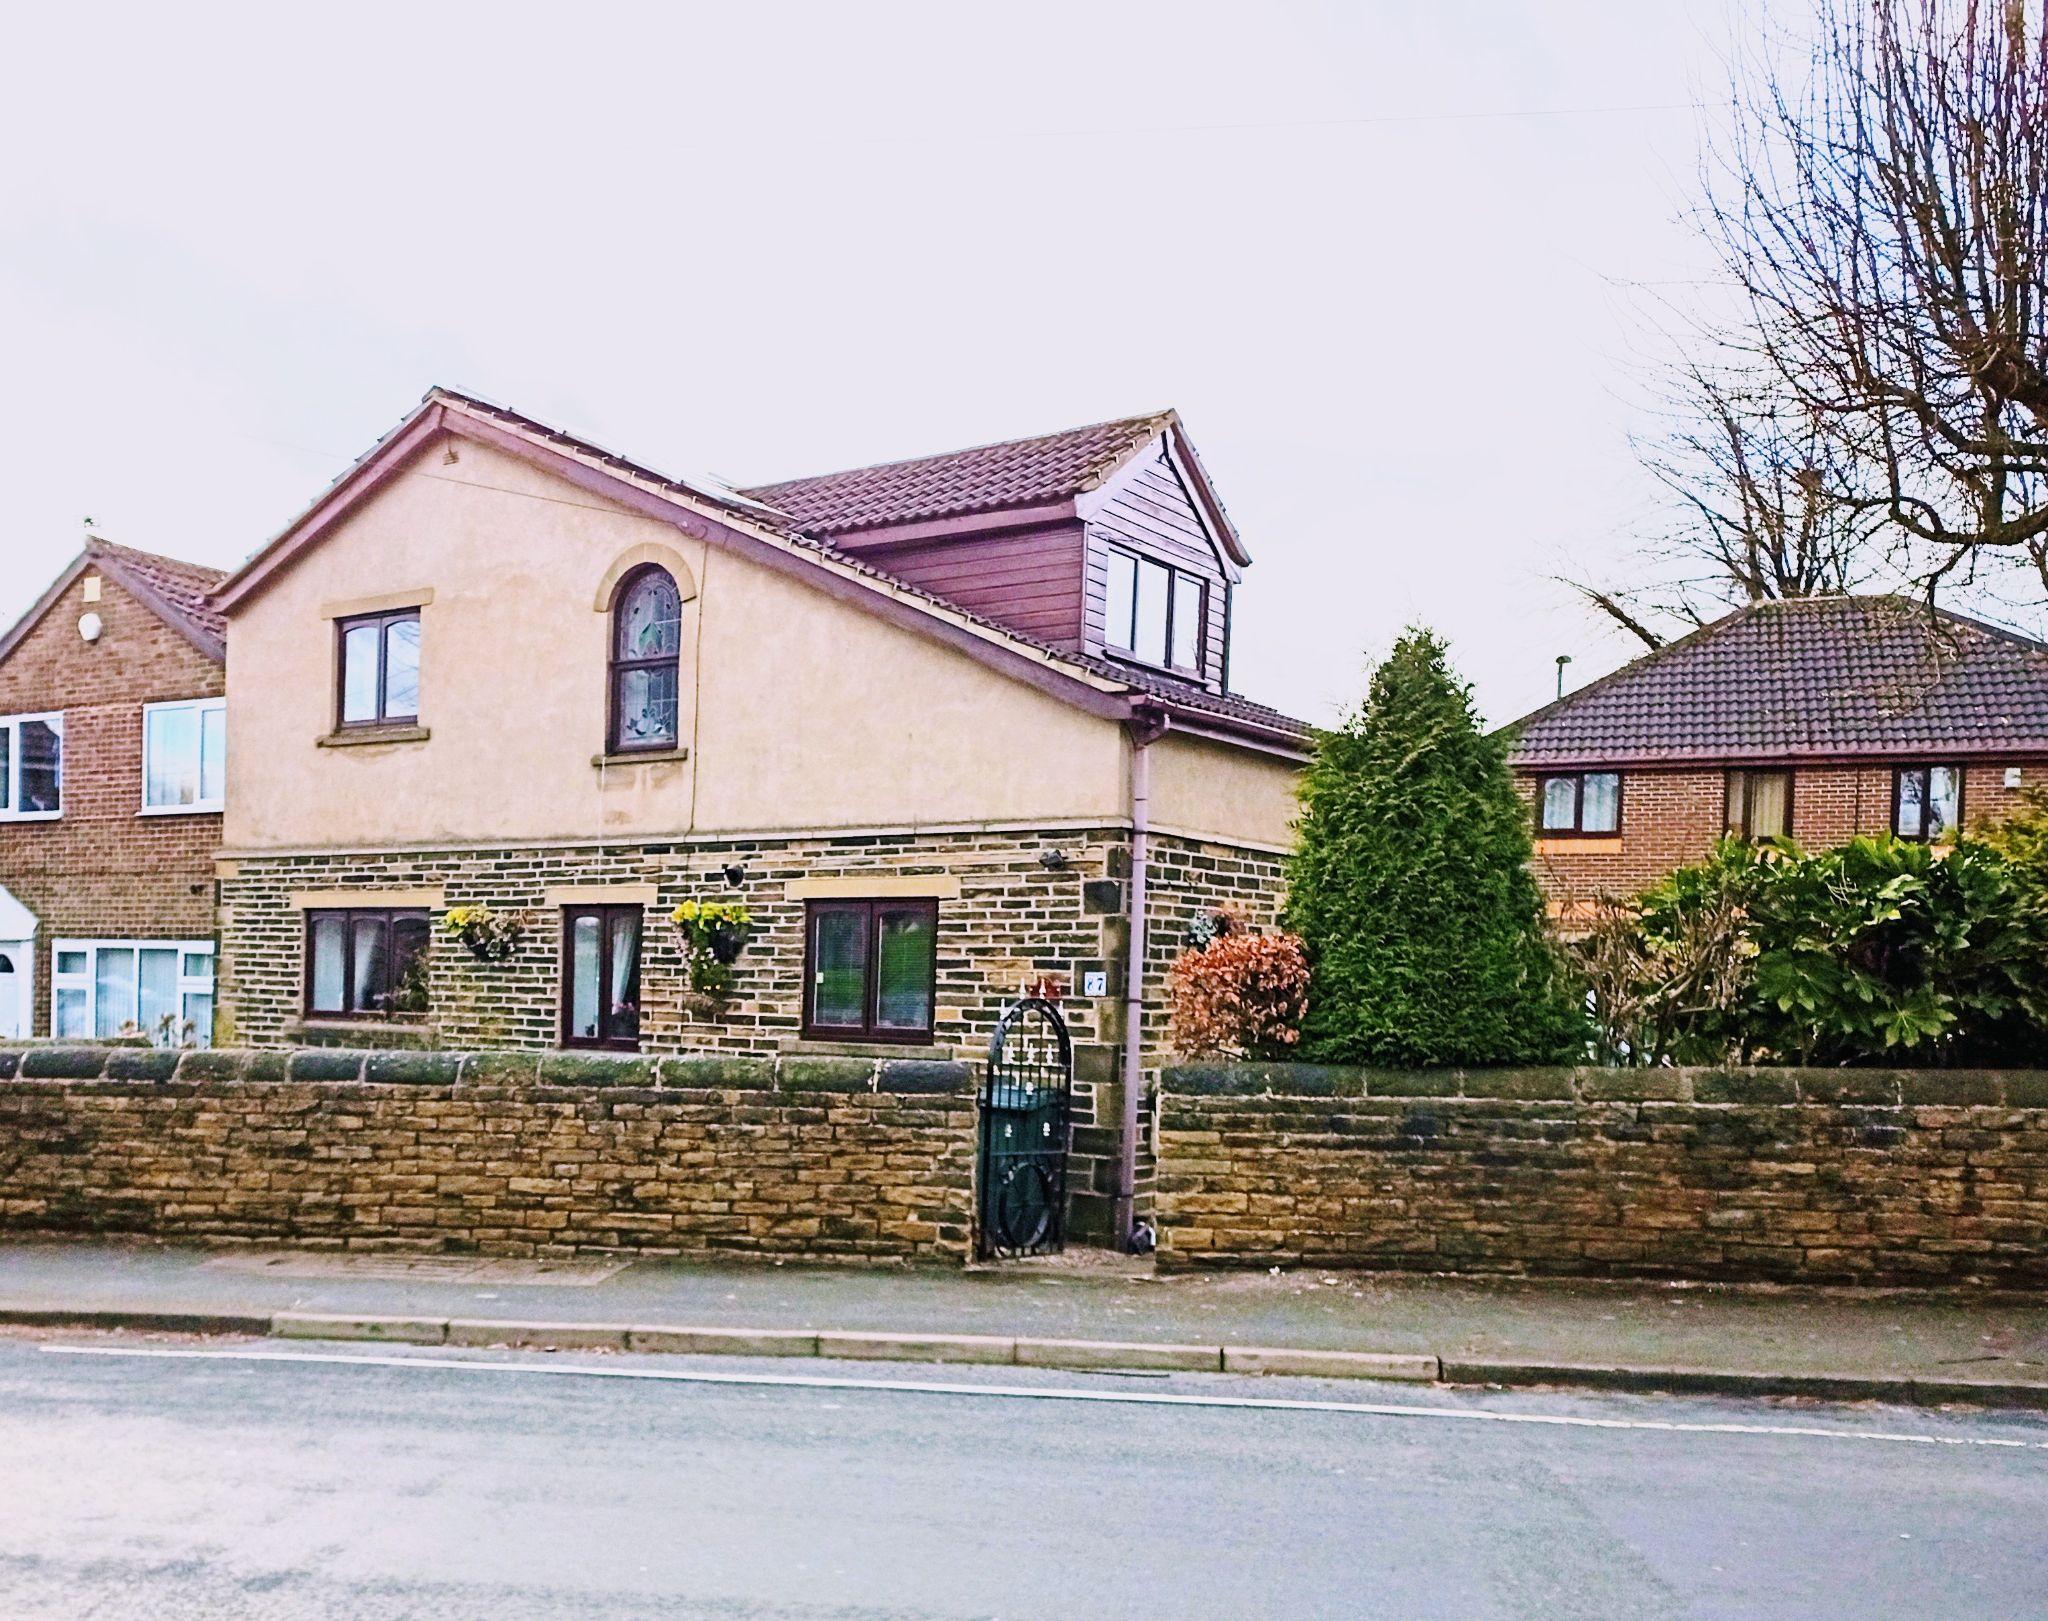 3 Bedroom Detached House For Sale - Exterior